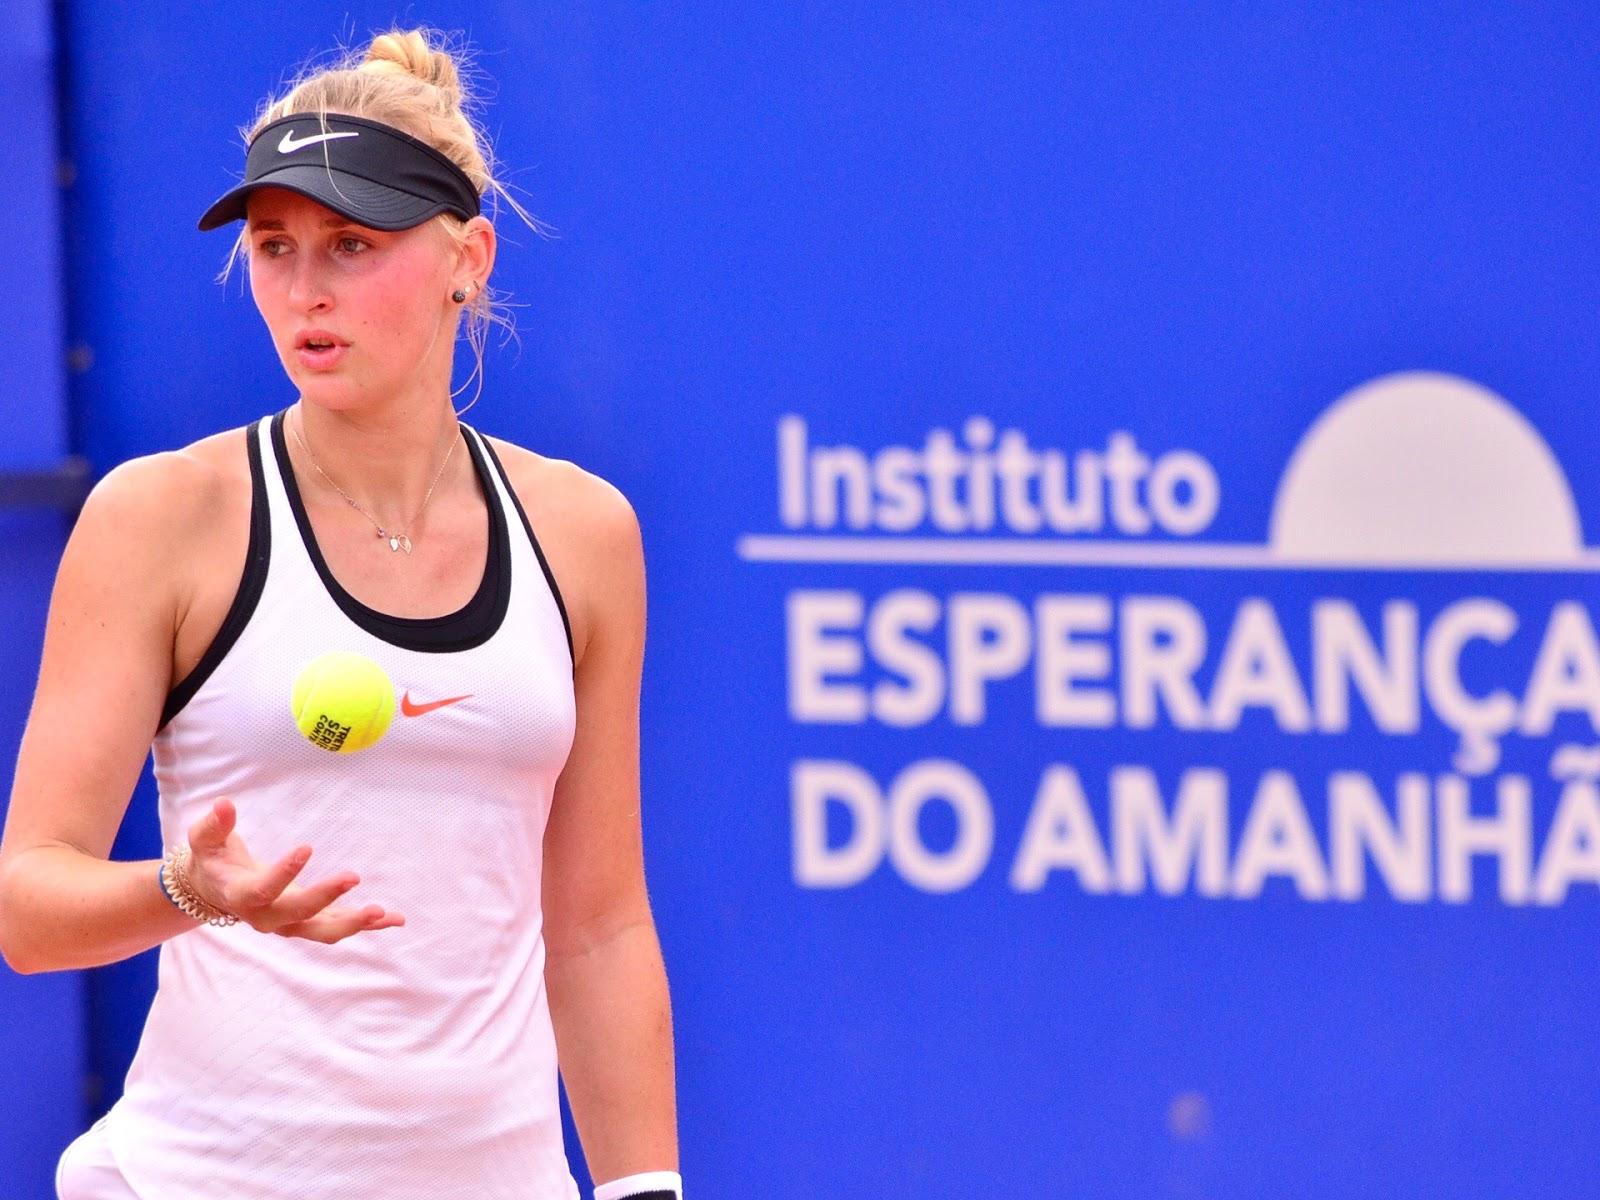 447e1a8ebfe Curitiba recebe pela sexta vez o Circuito Feminino Future de Tênis ...